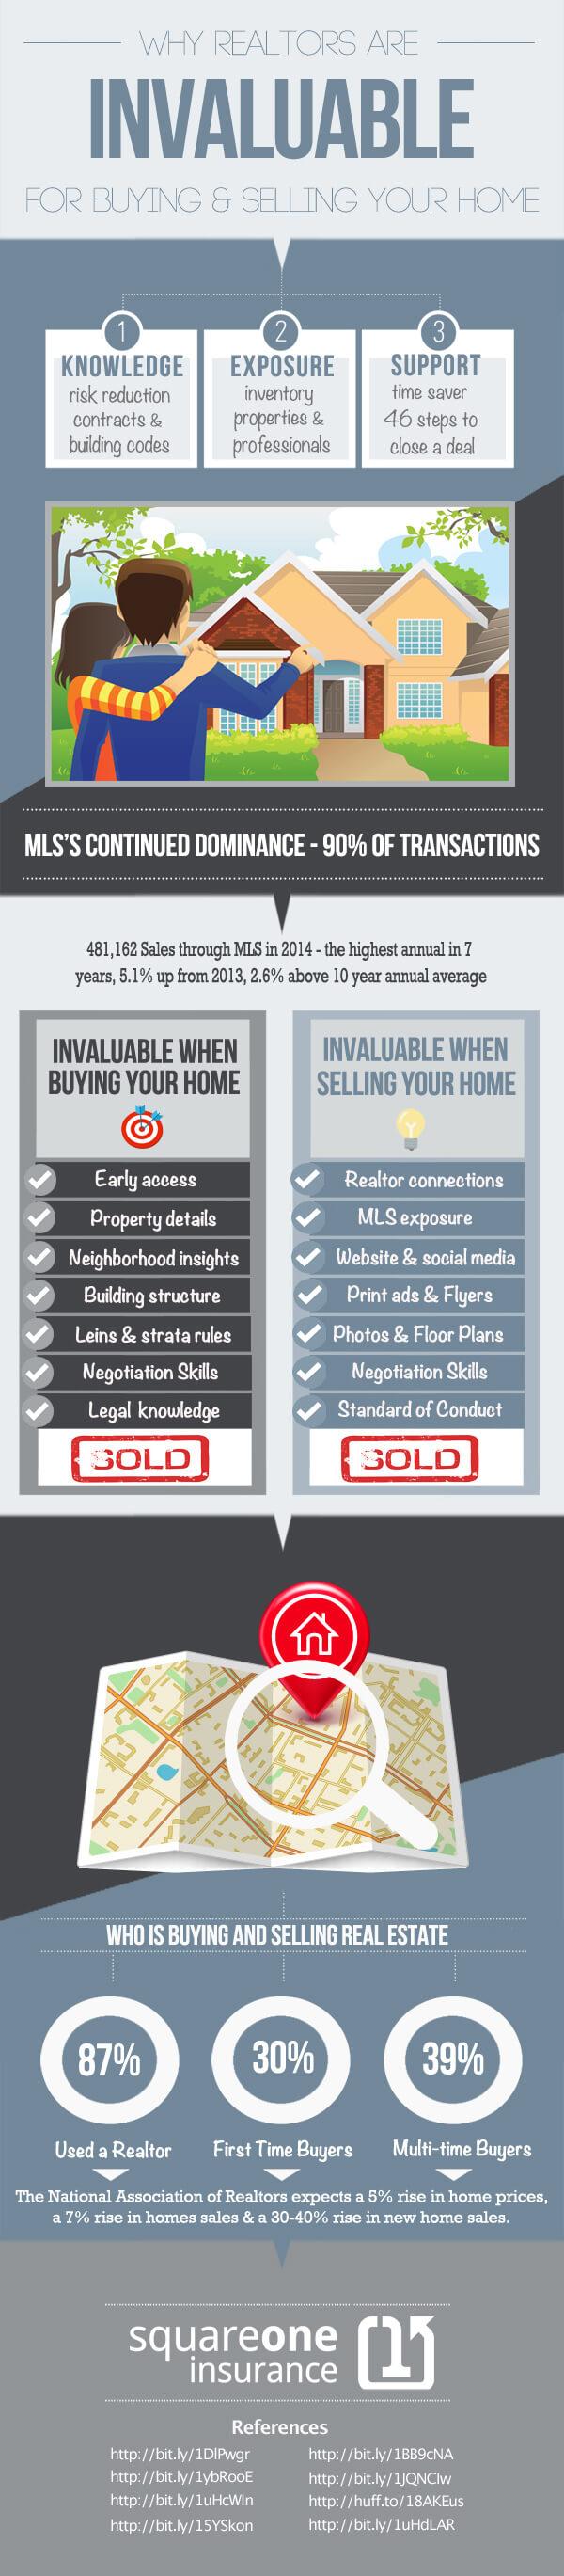 Why Realtors are Invaluable